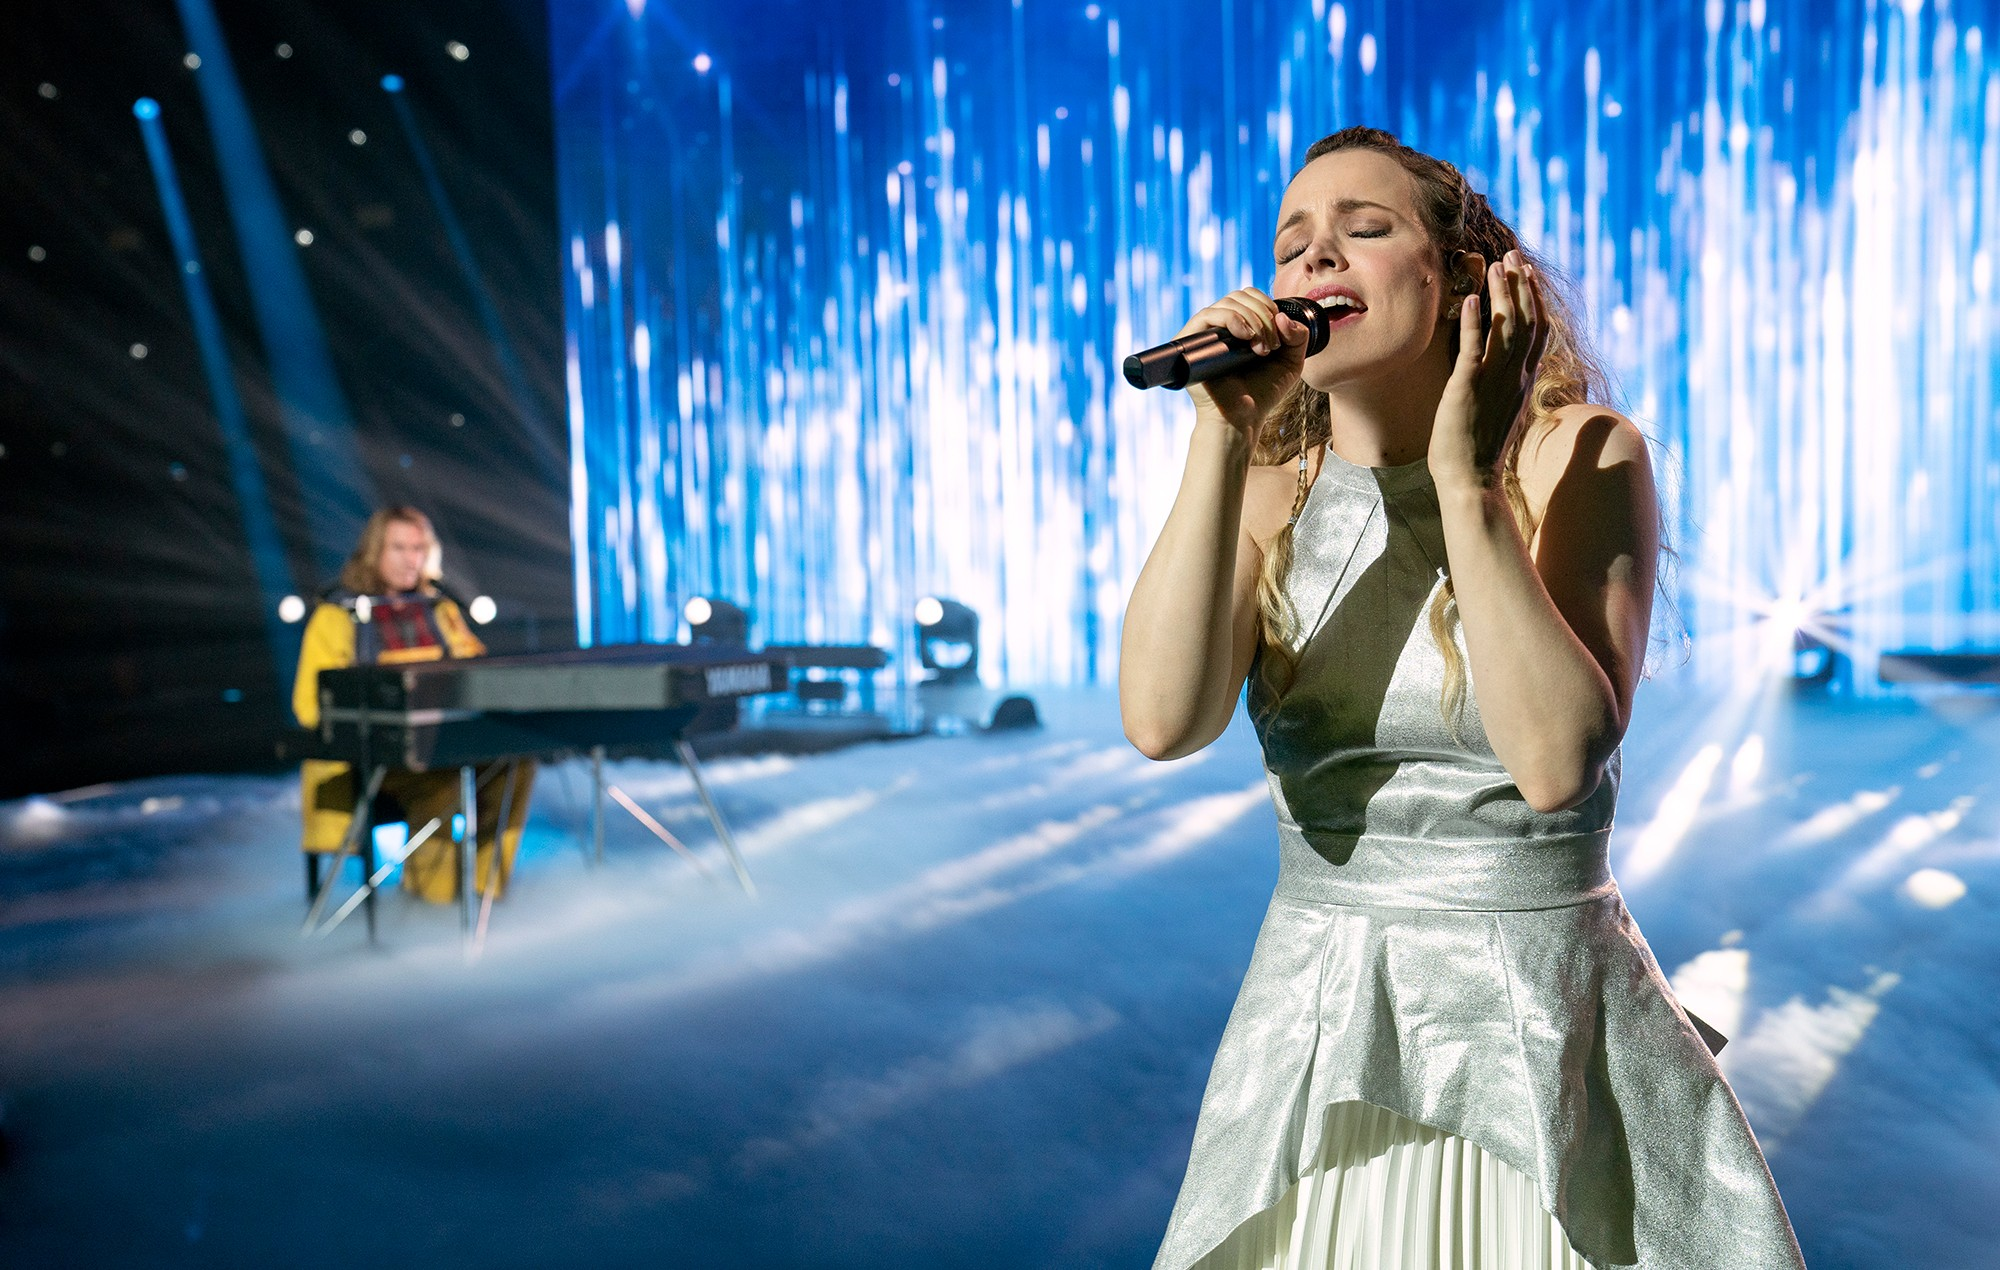 MacAdams_Ferrell_Eurovision.jpg